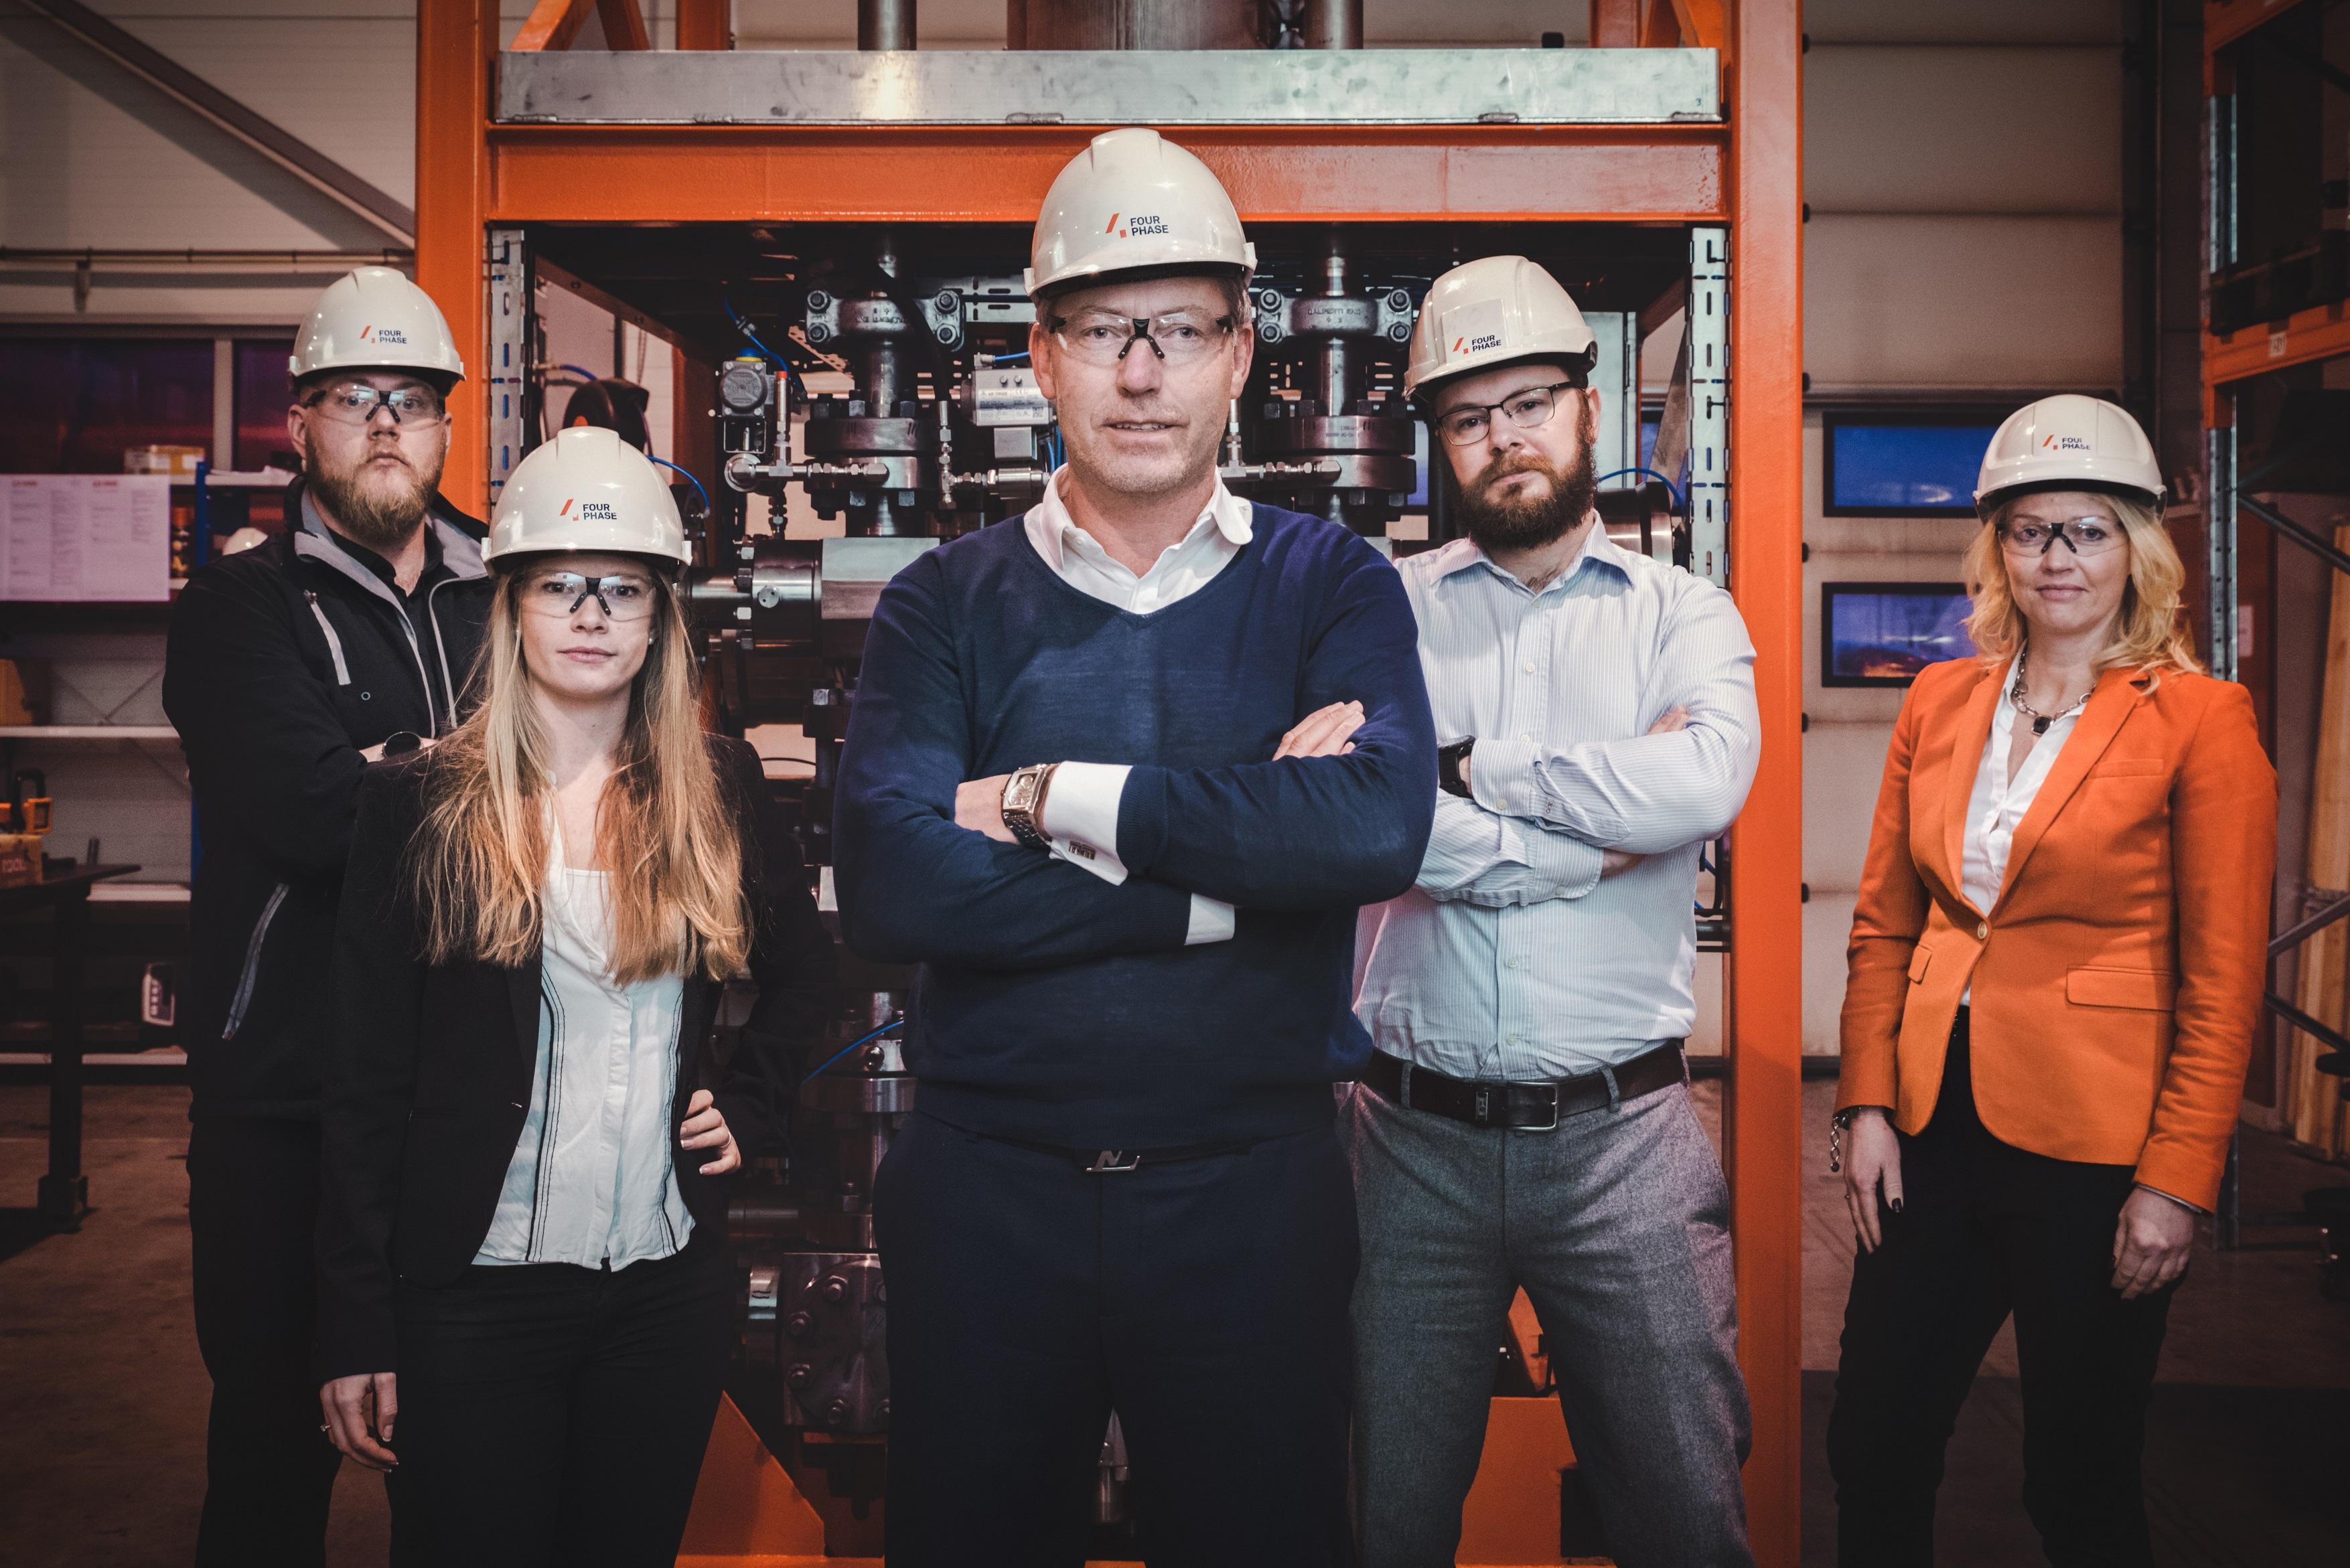 L to R Jørgen Bruntveit (VP Operations), Marianne Mikalsen (Operations Manager), Torstein Nedreaas (Equipment and Procurement Manager), Anne Lene Langeland (HSE&Q Manager) and Øyvind Heradstveit (CEO).